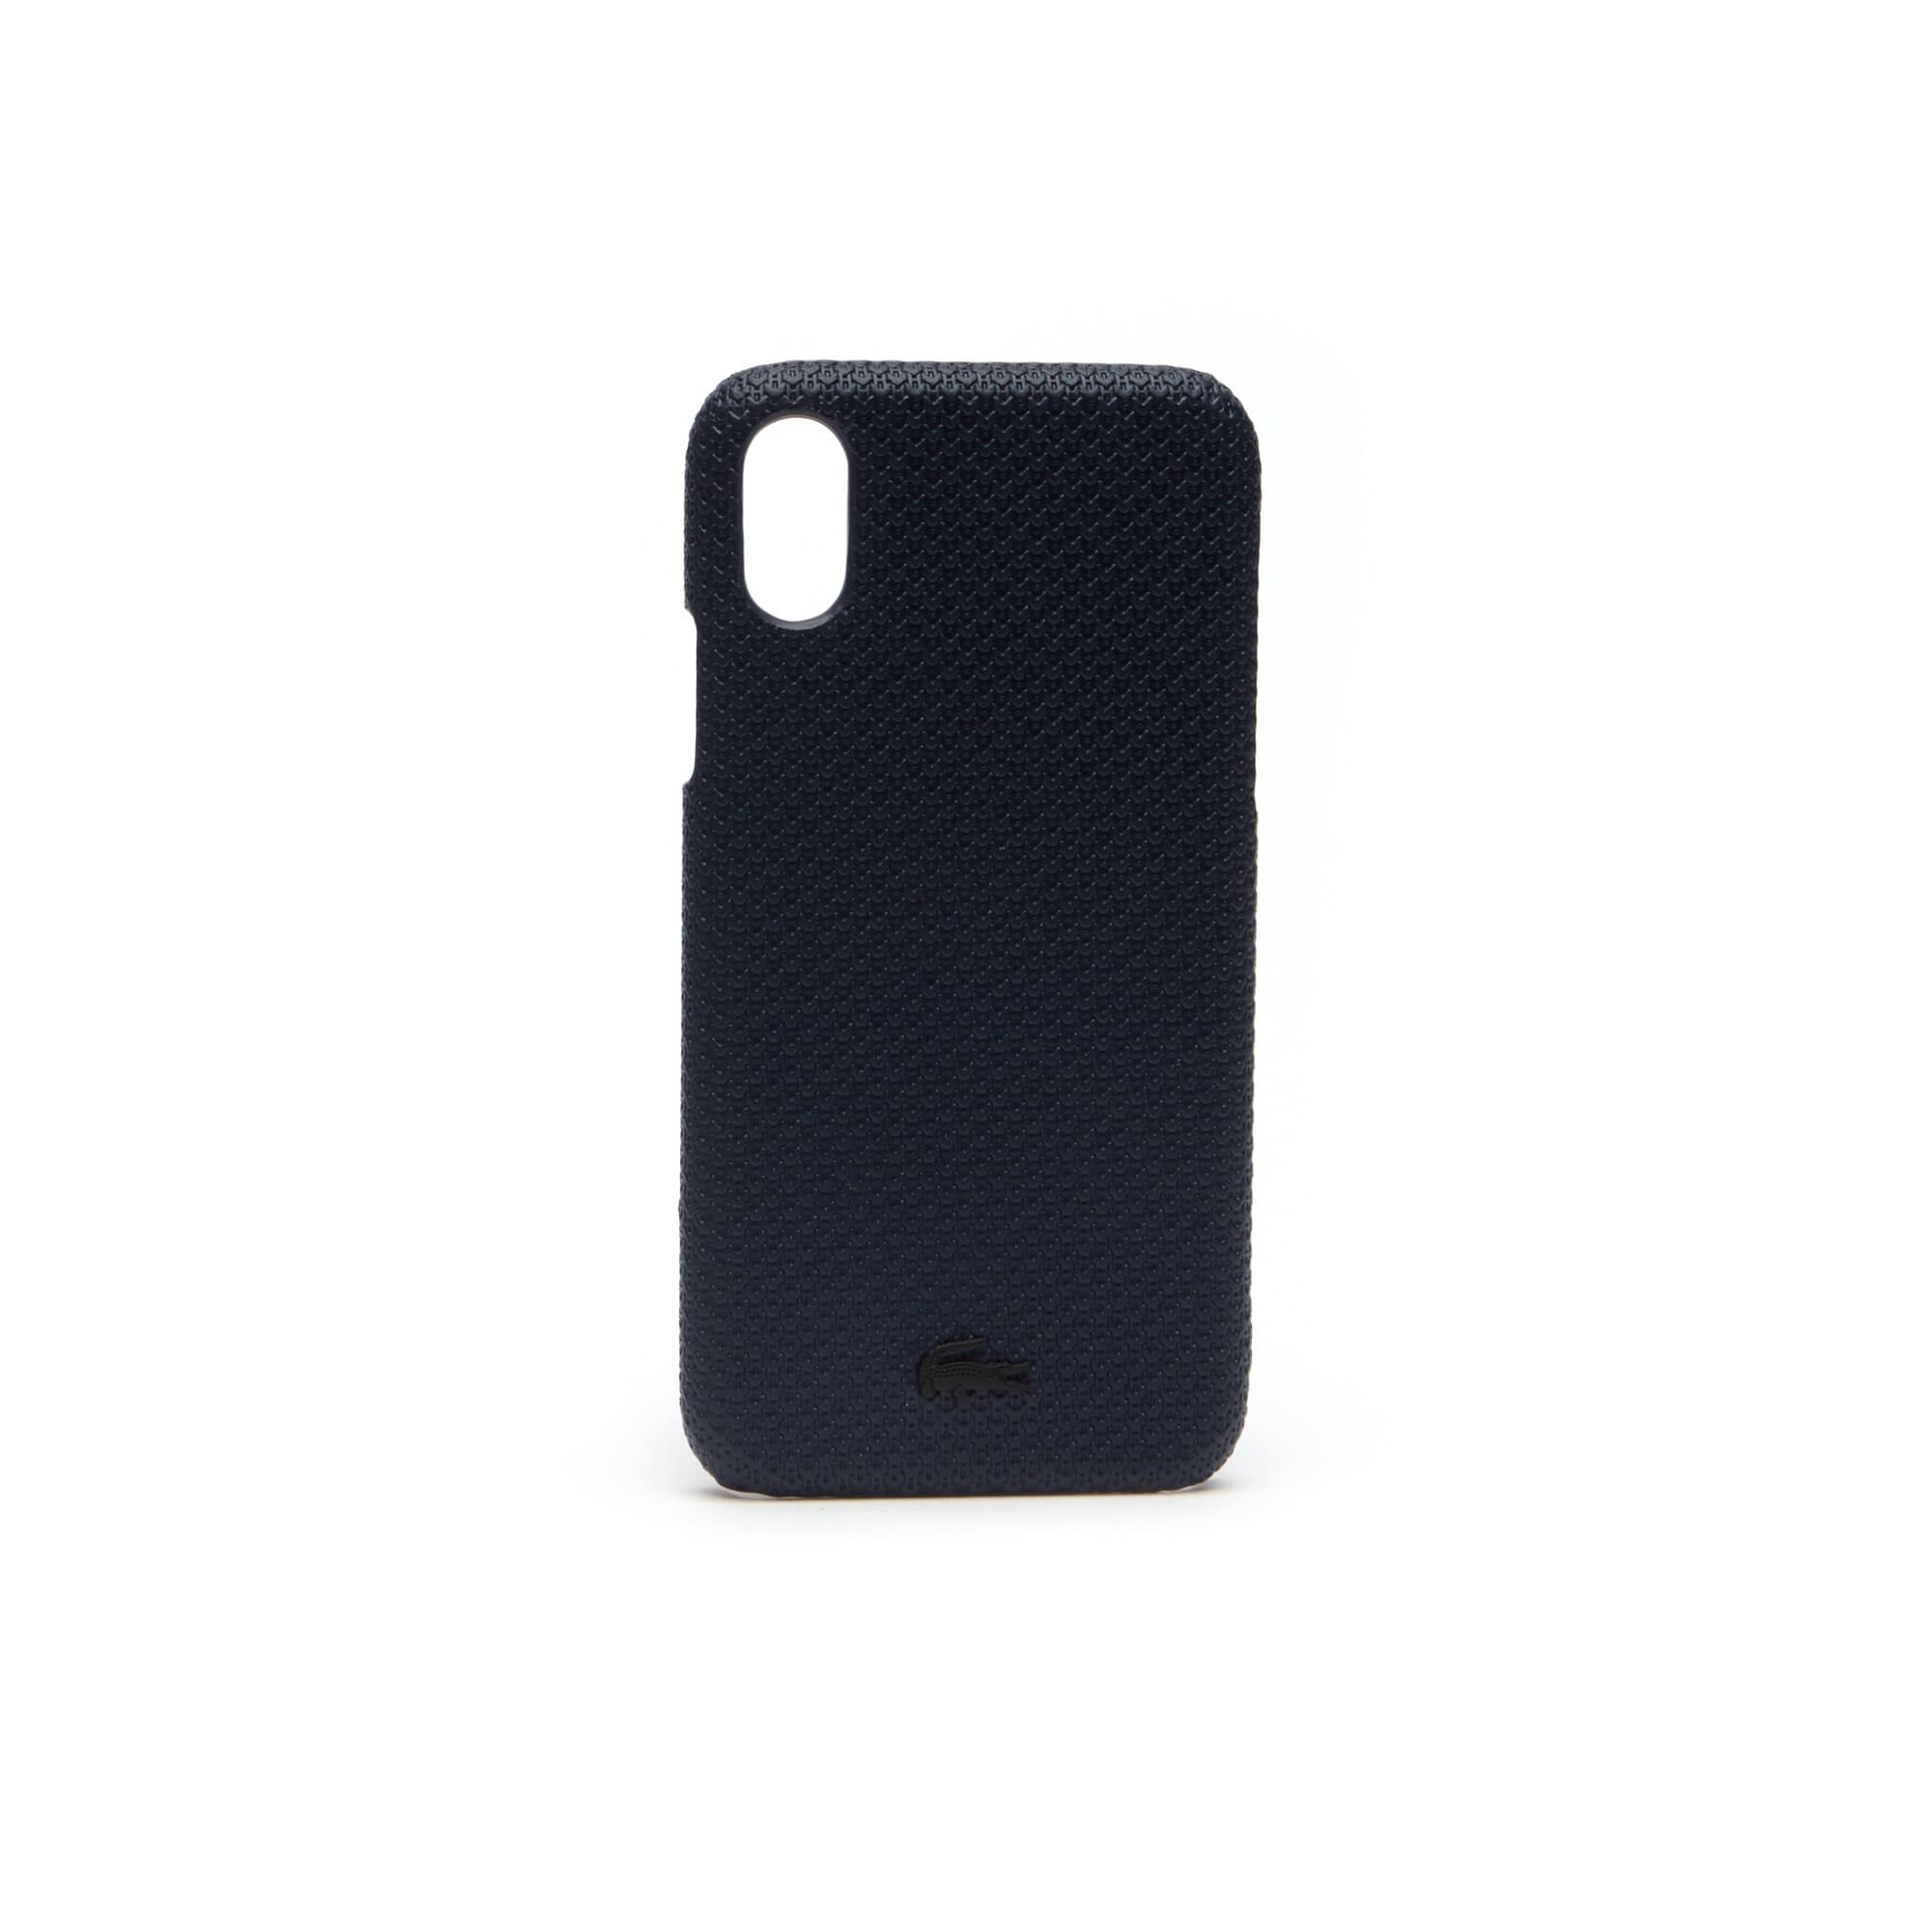 Capa para iPhone X Chantaco em pele piqué mate